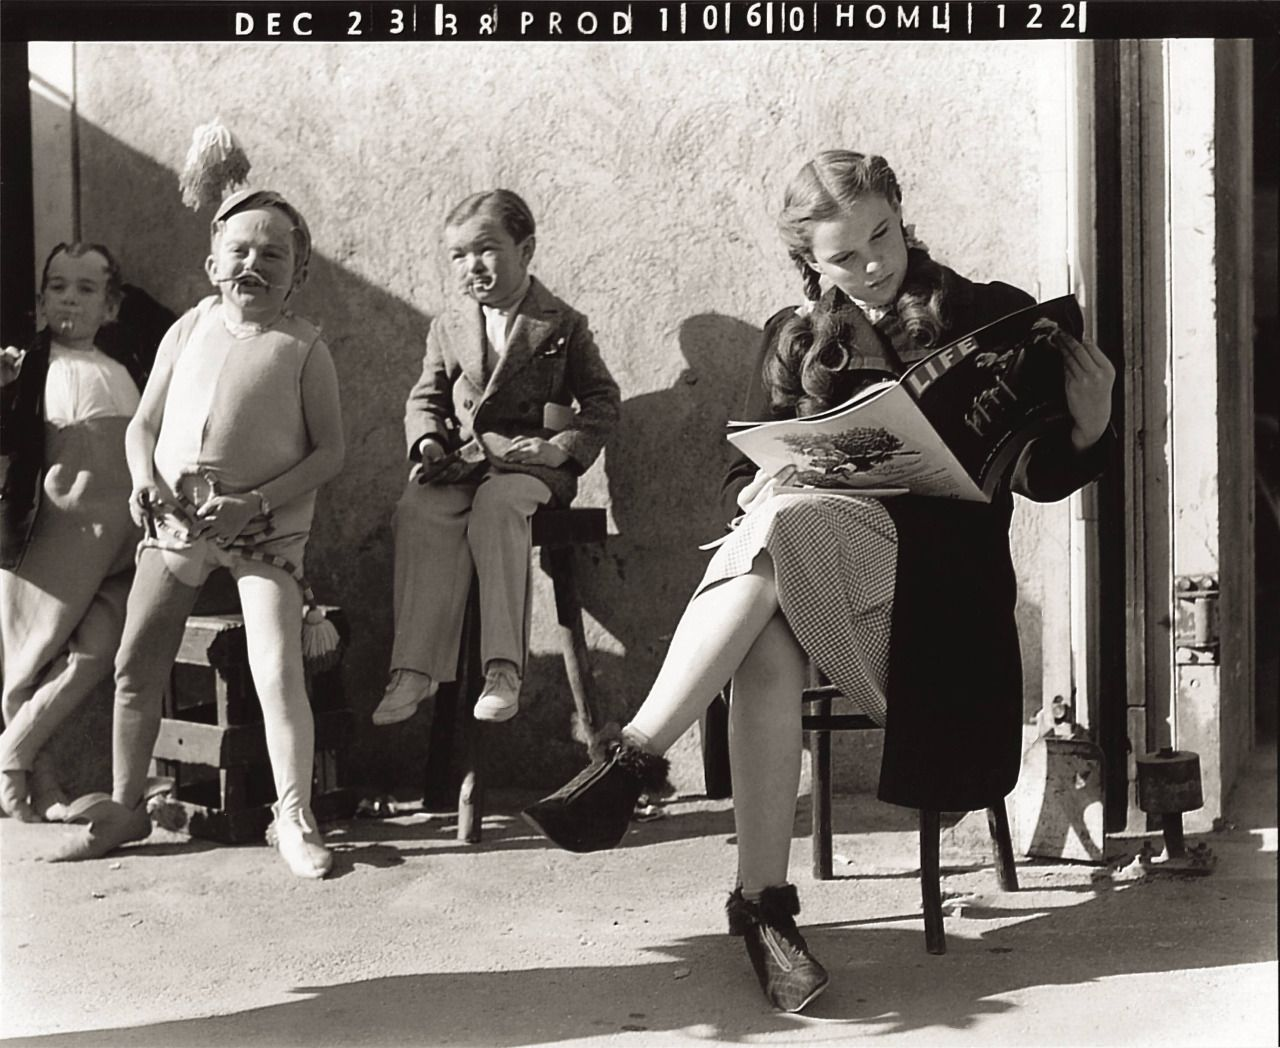 Print of Judy Garland, Ray Bolger, Bert Lahr, and Jack